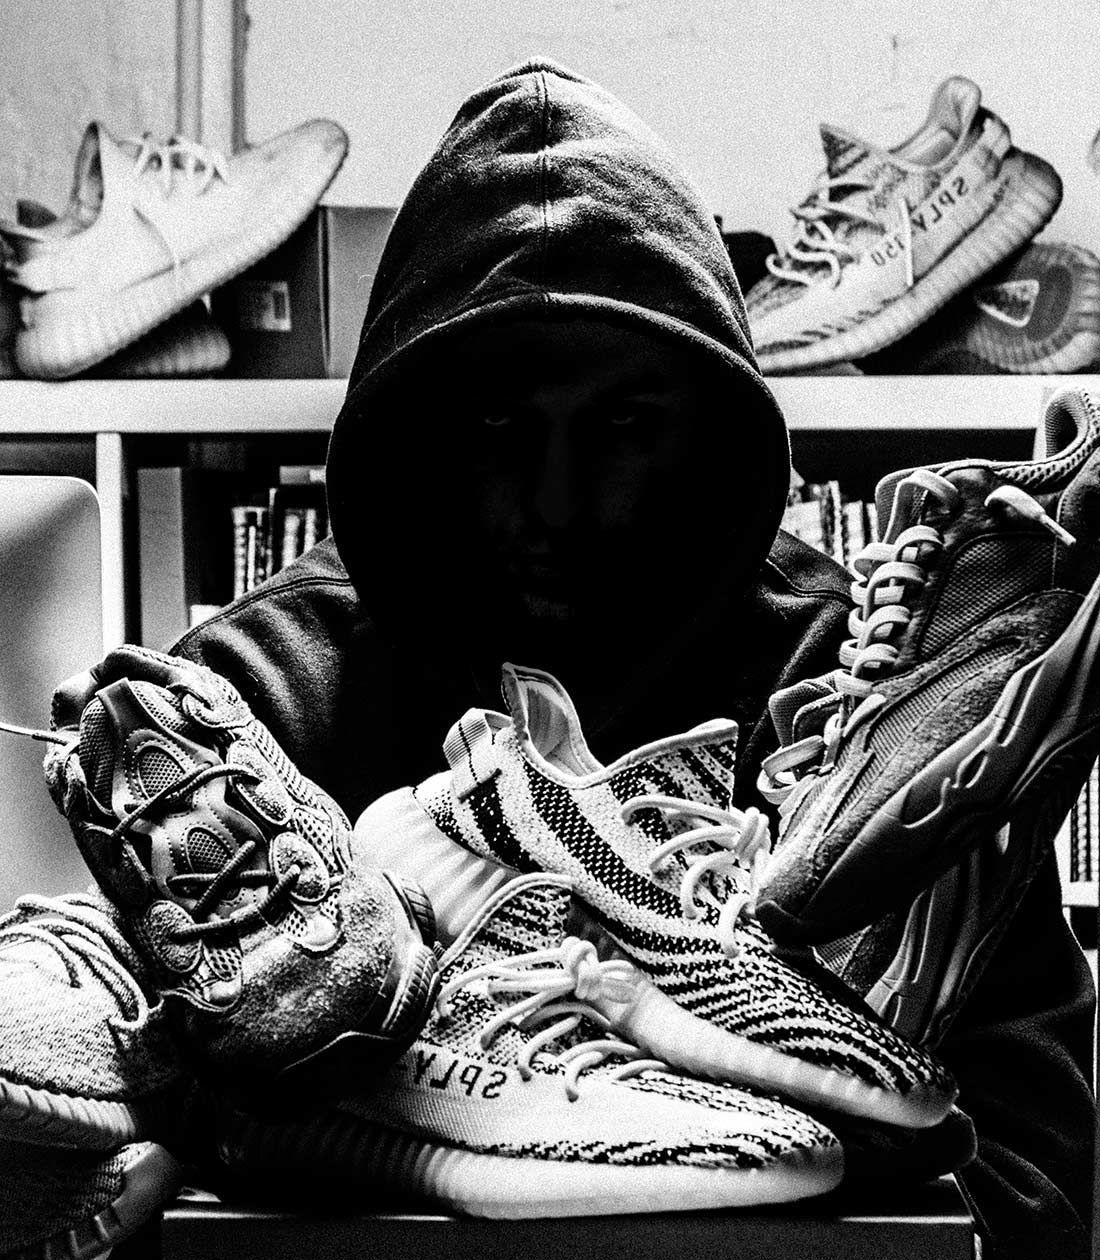 Yeezy Mafia Interview Hooded Figure